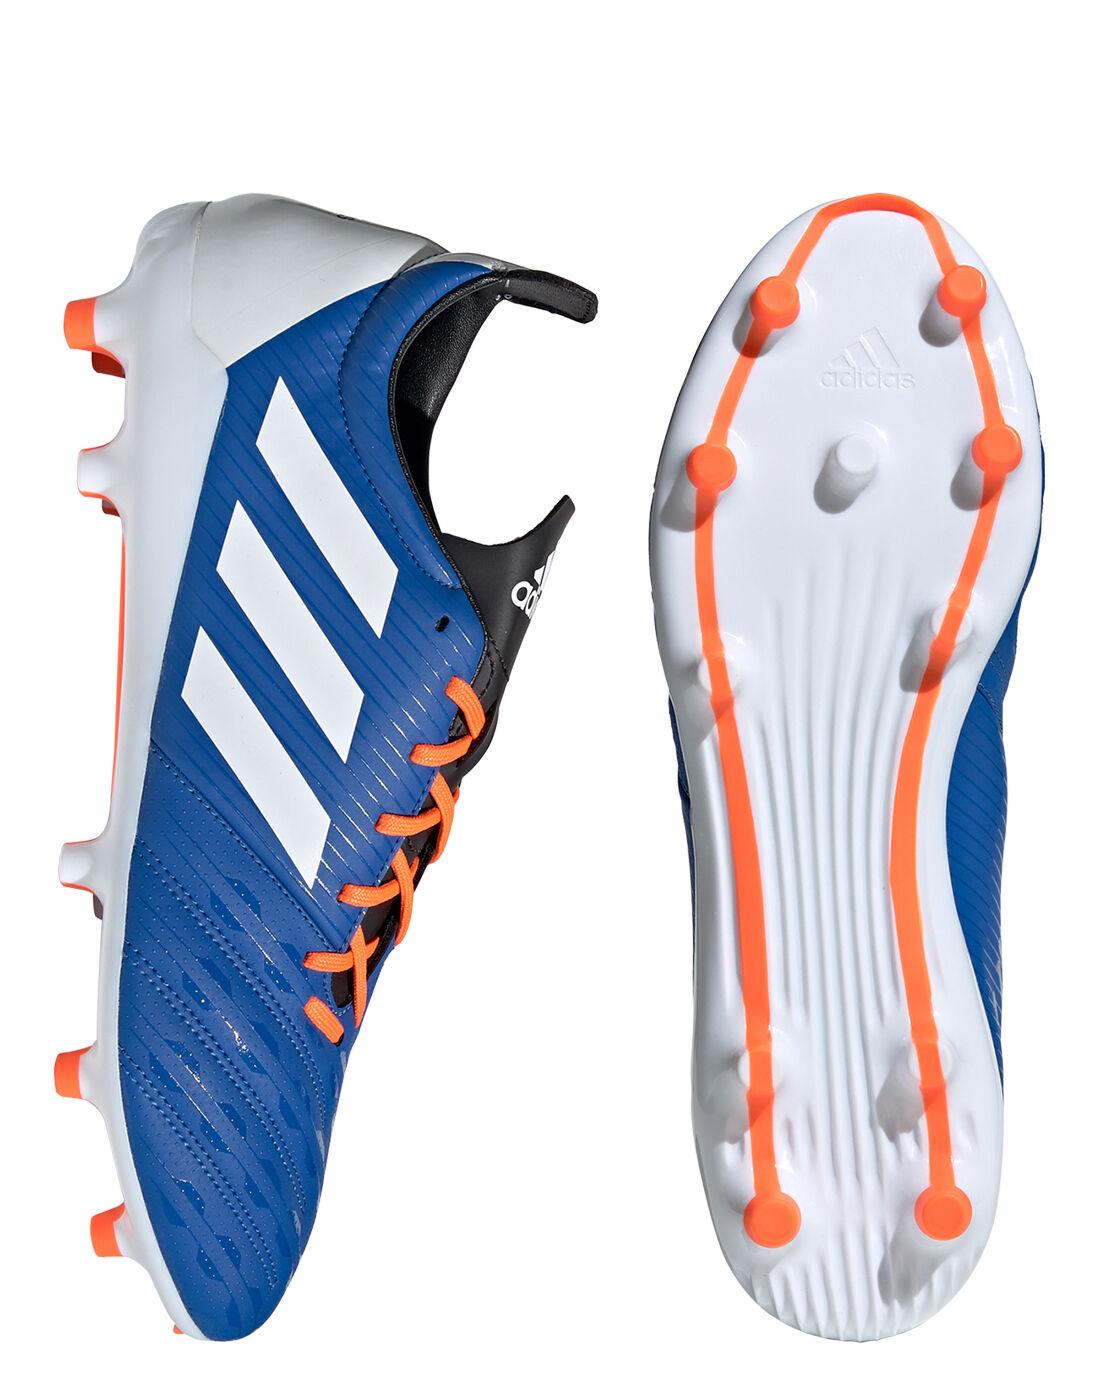 adidas ADULT MALICE FG - Blue | Life